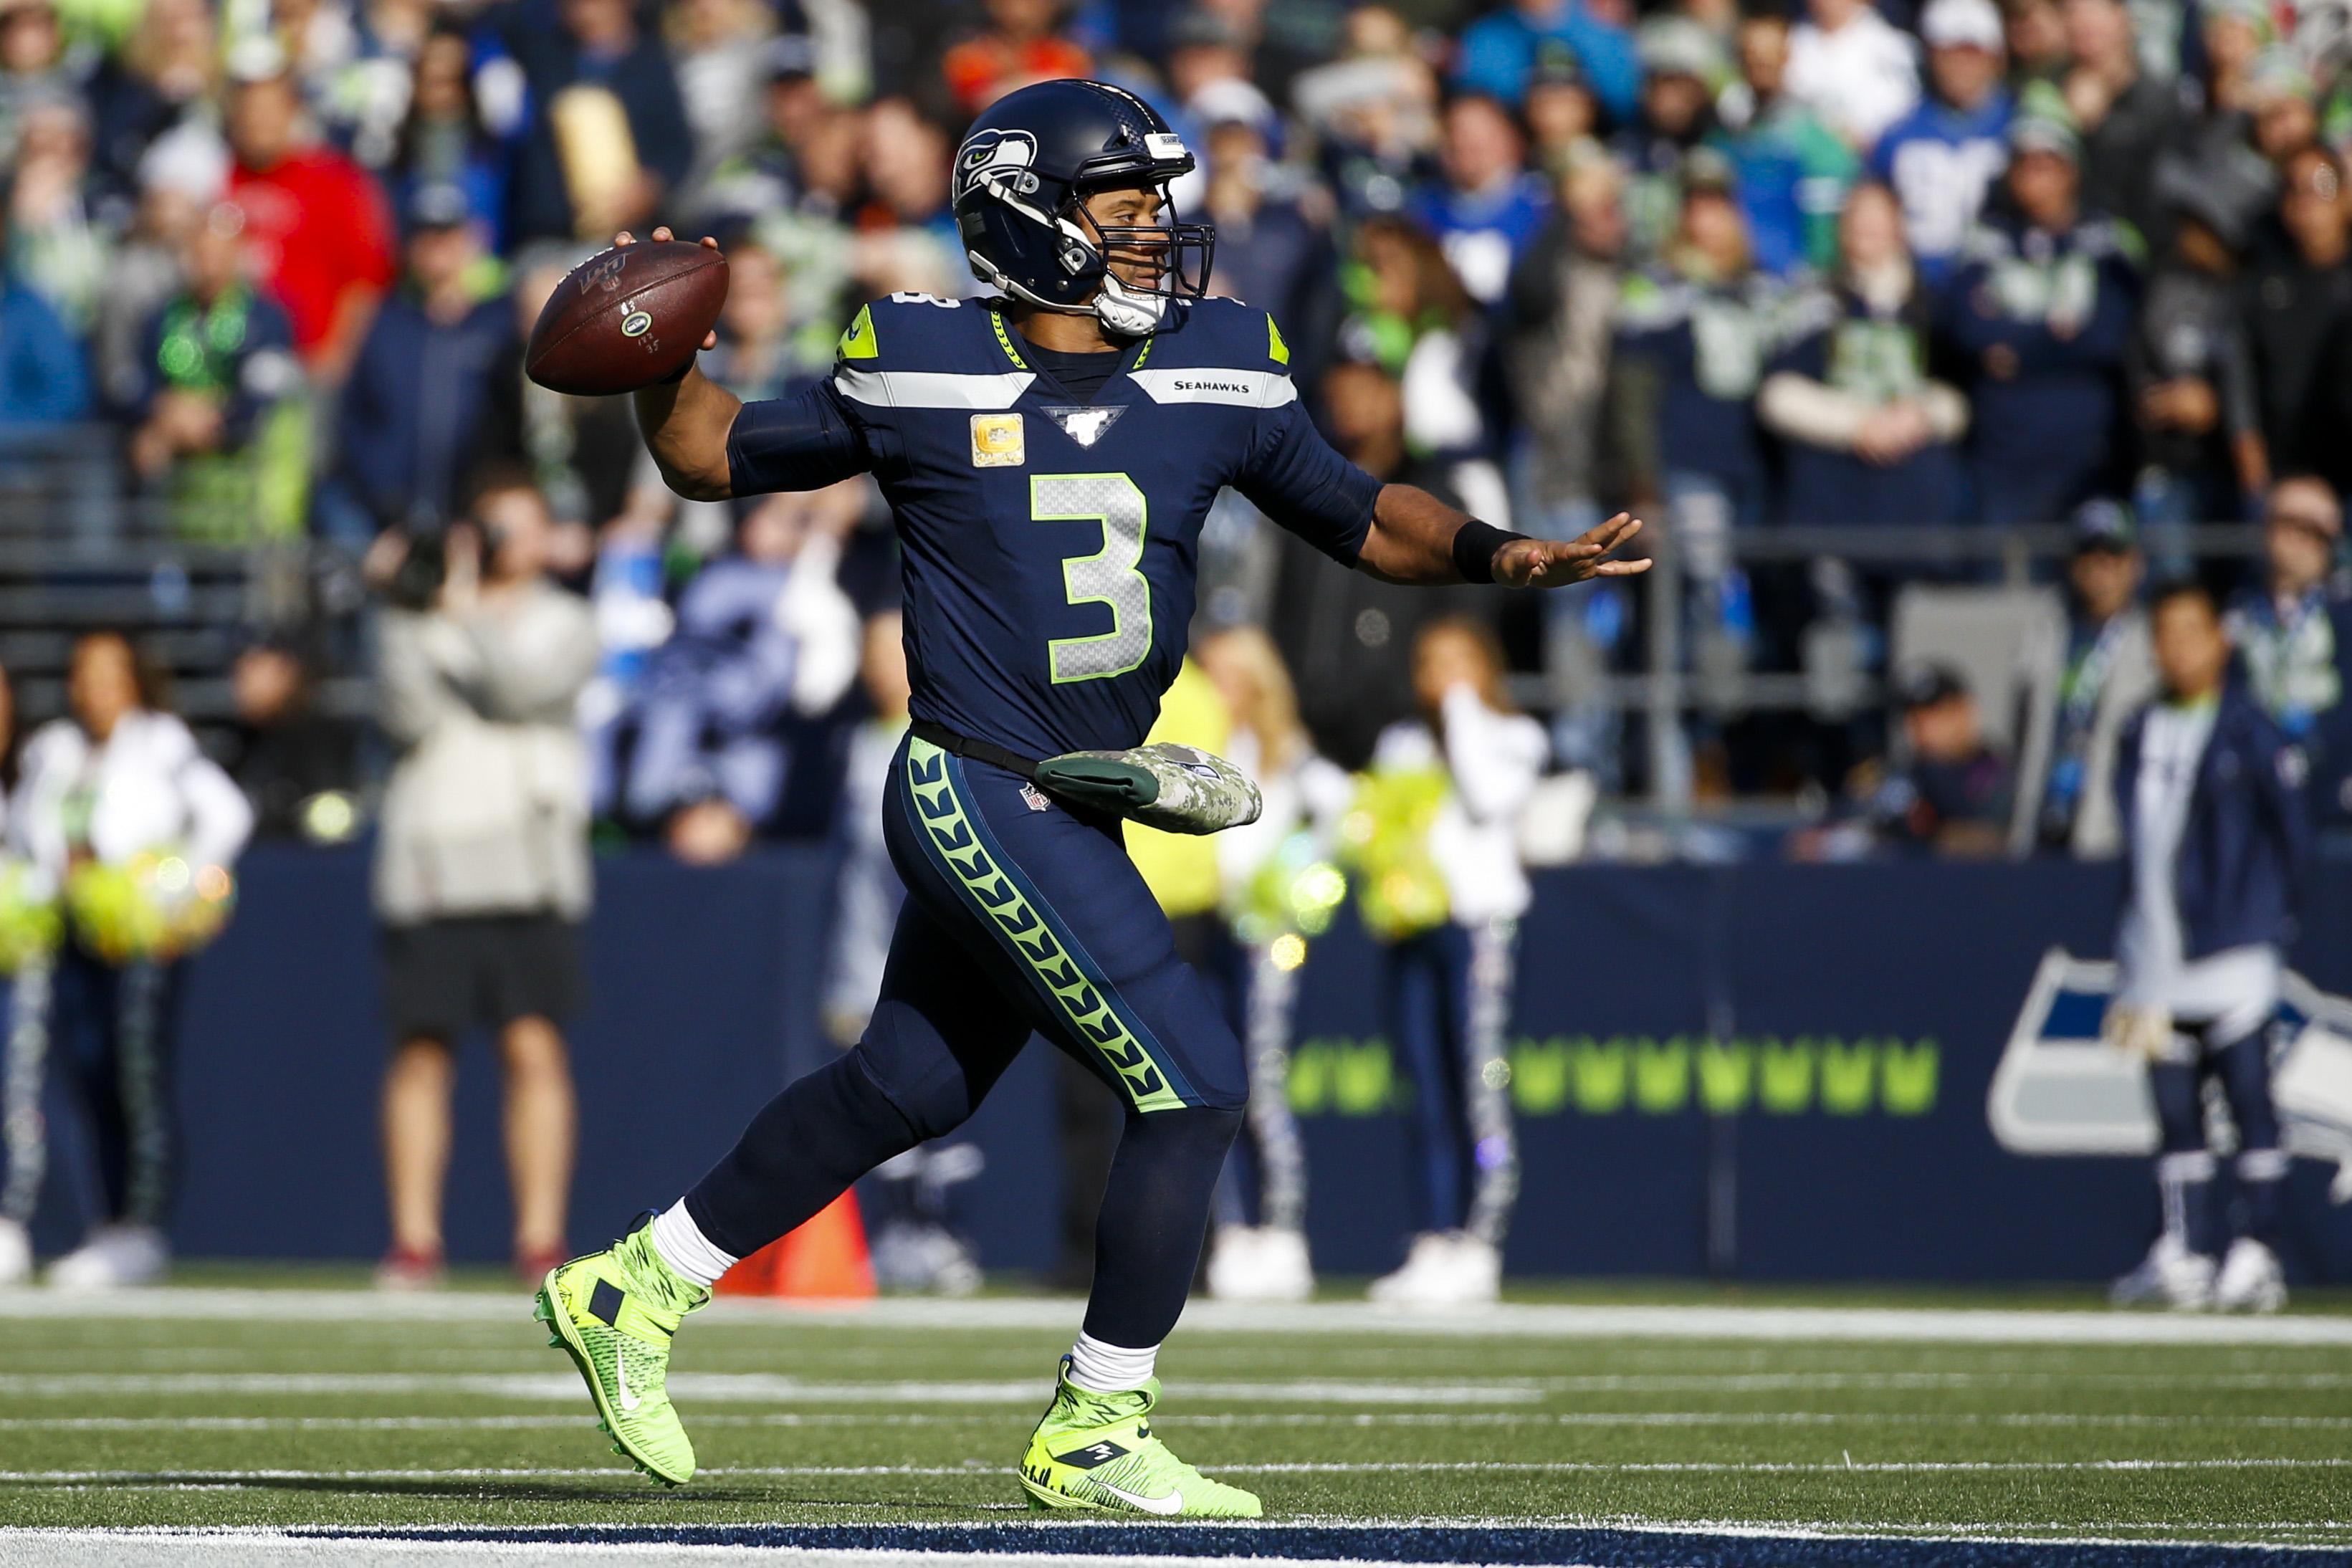 NFL: Tampa Bay Buccaneers at Seattle Seahawks